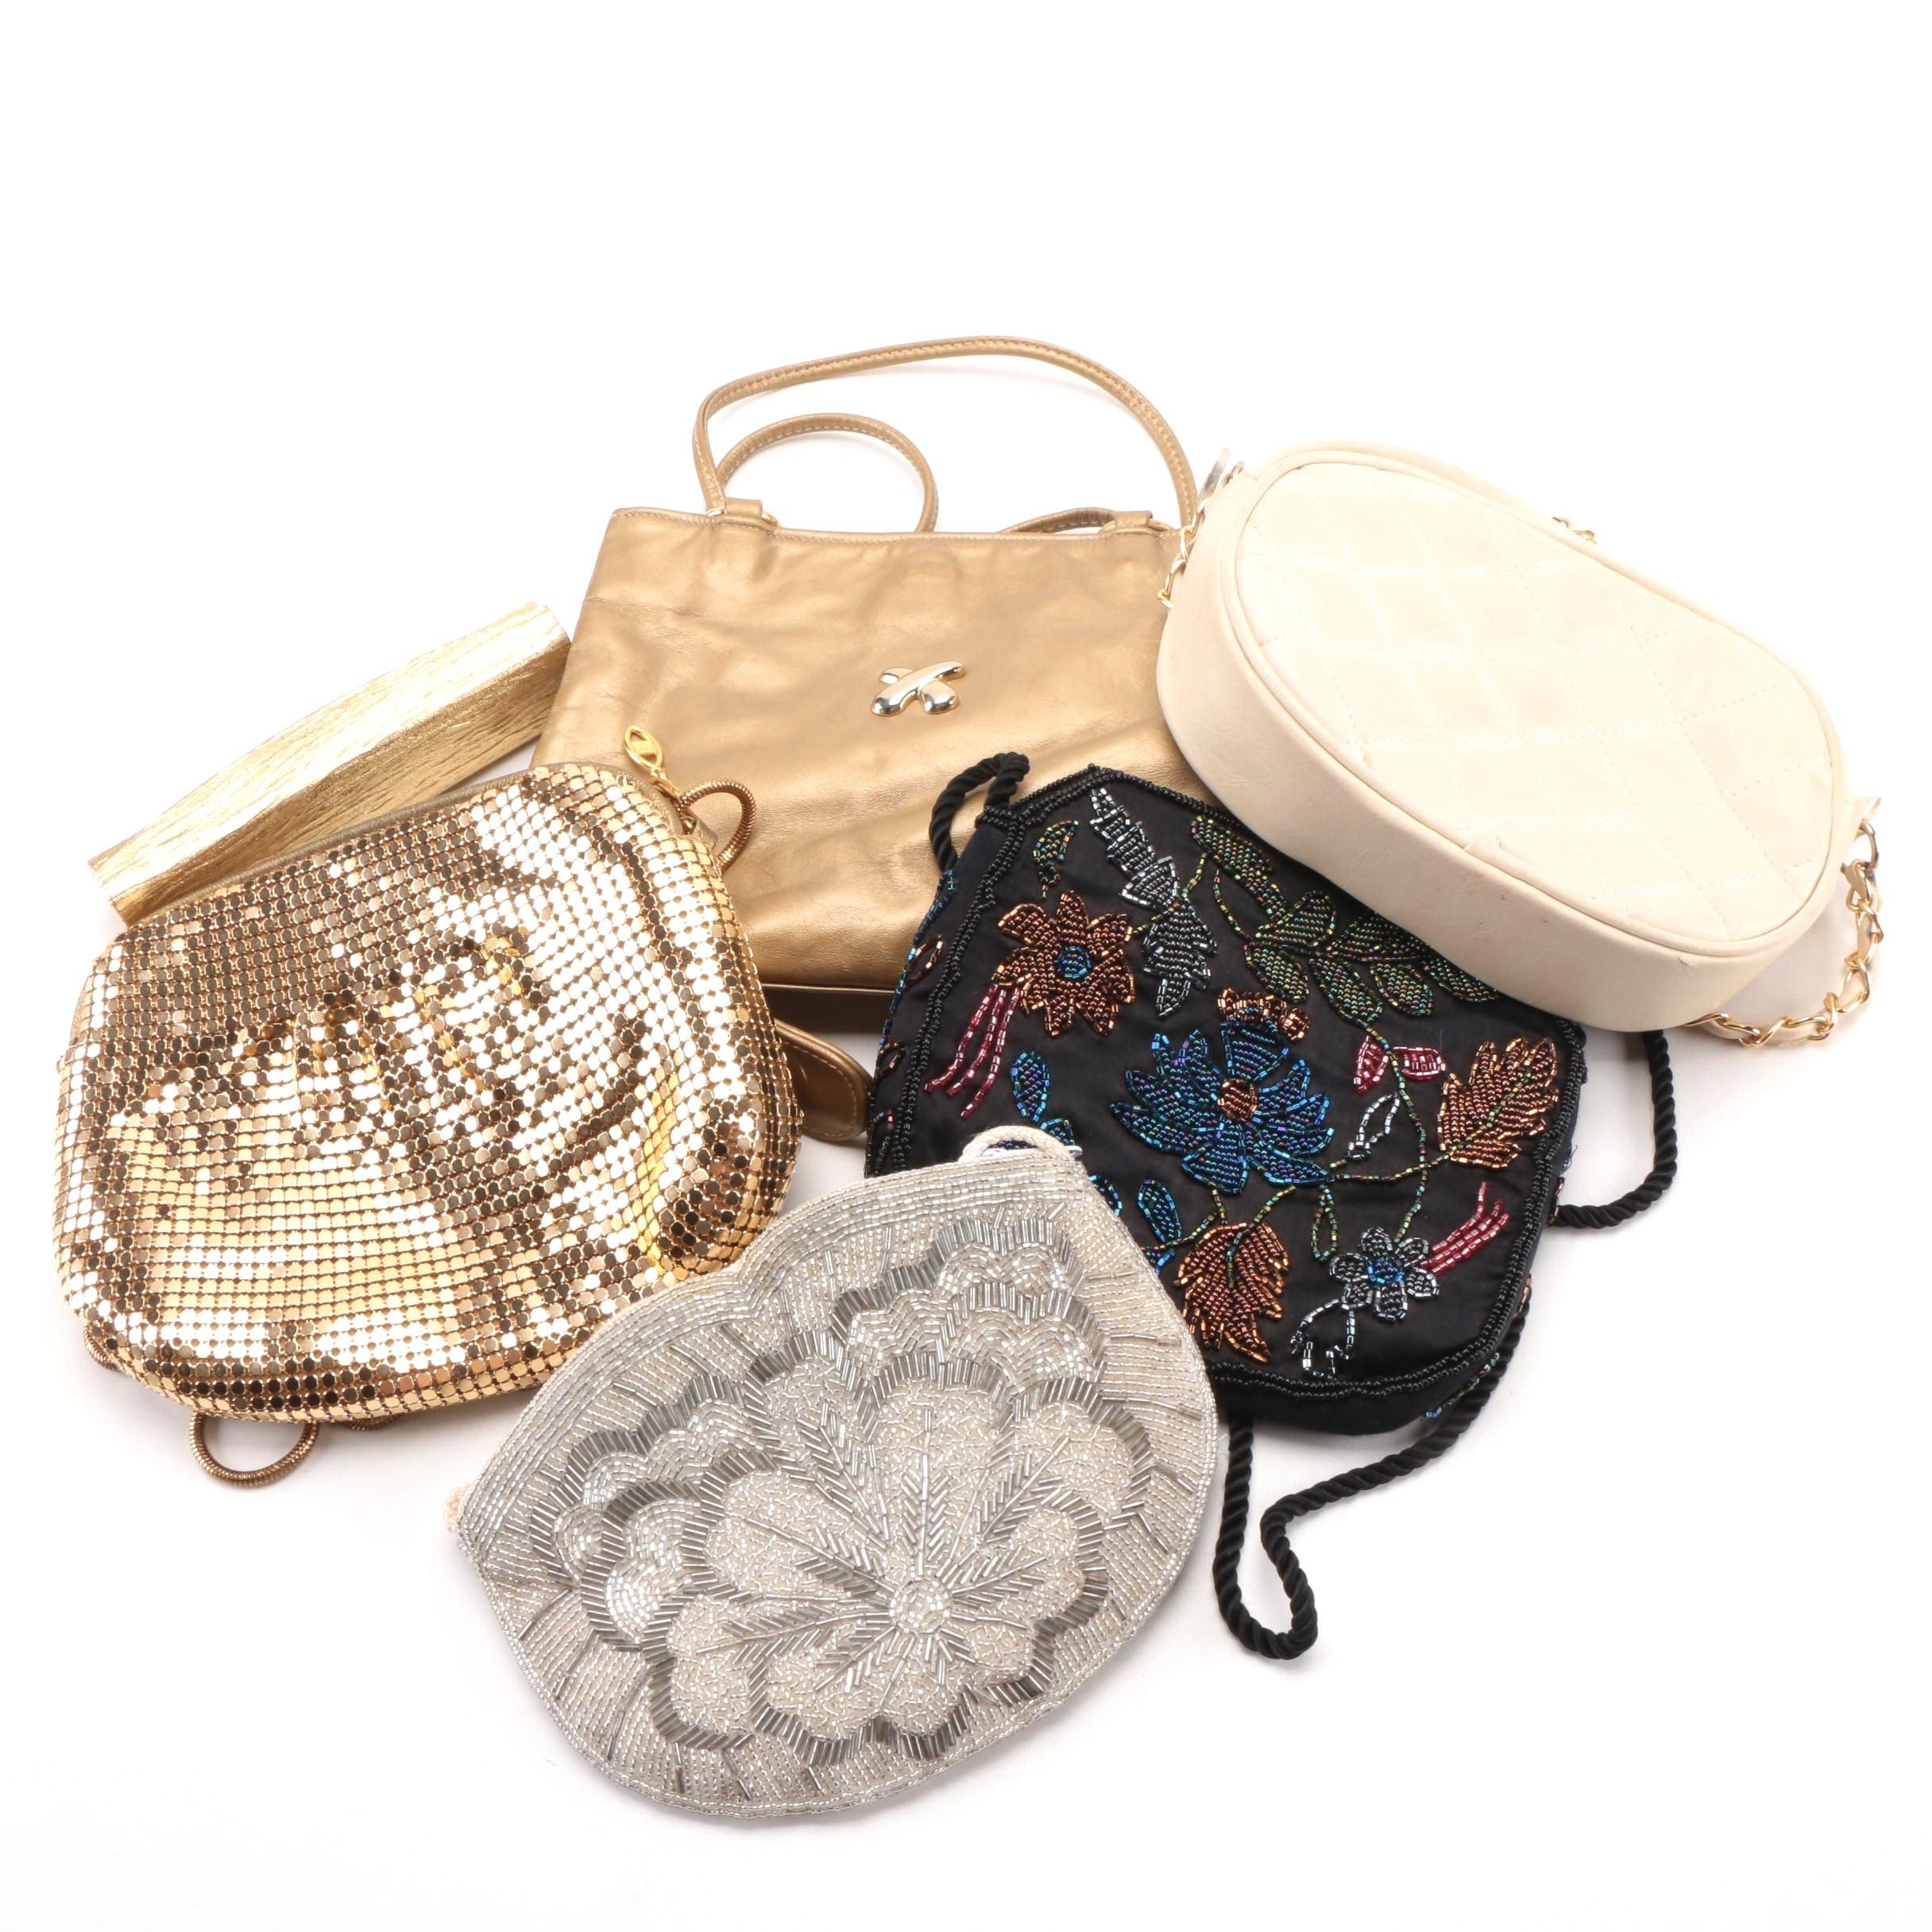 Handbags and Shoulder Bags Including Metal Mesh